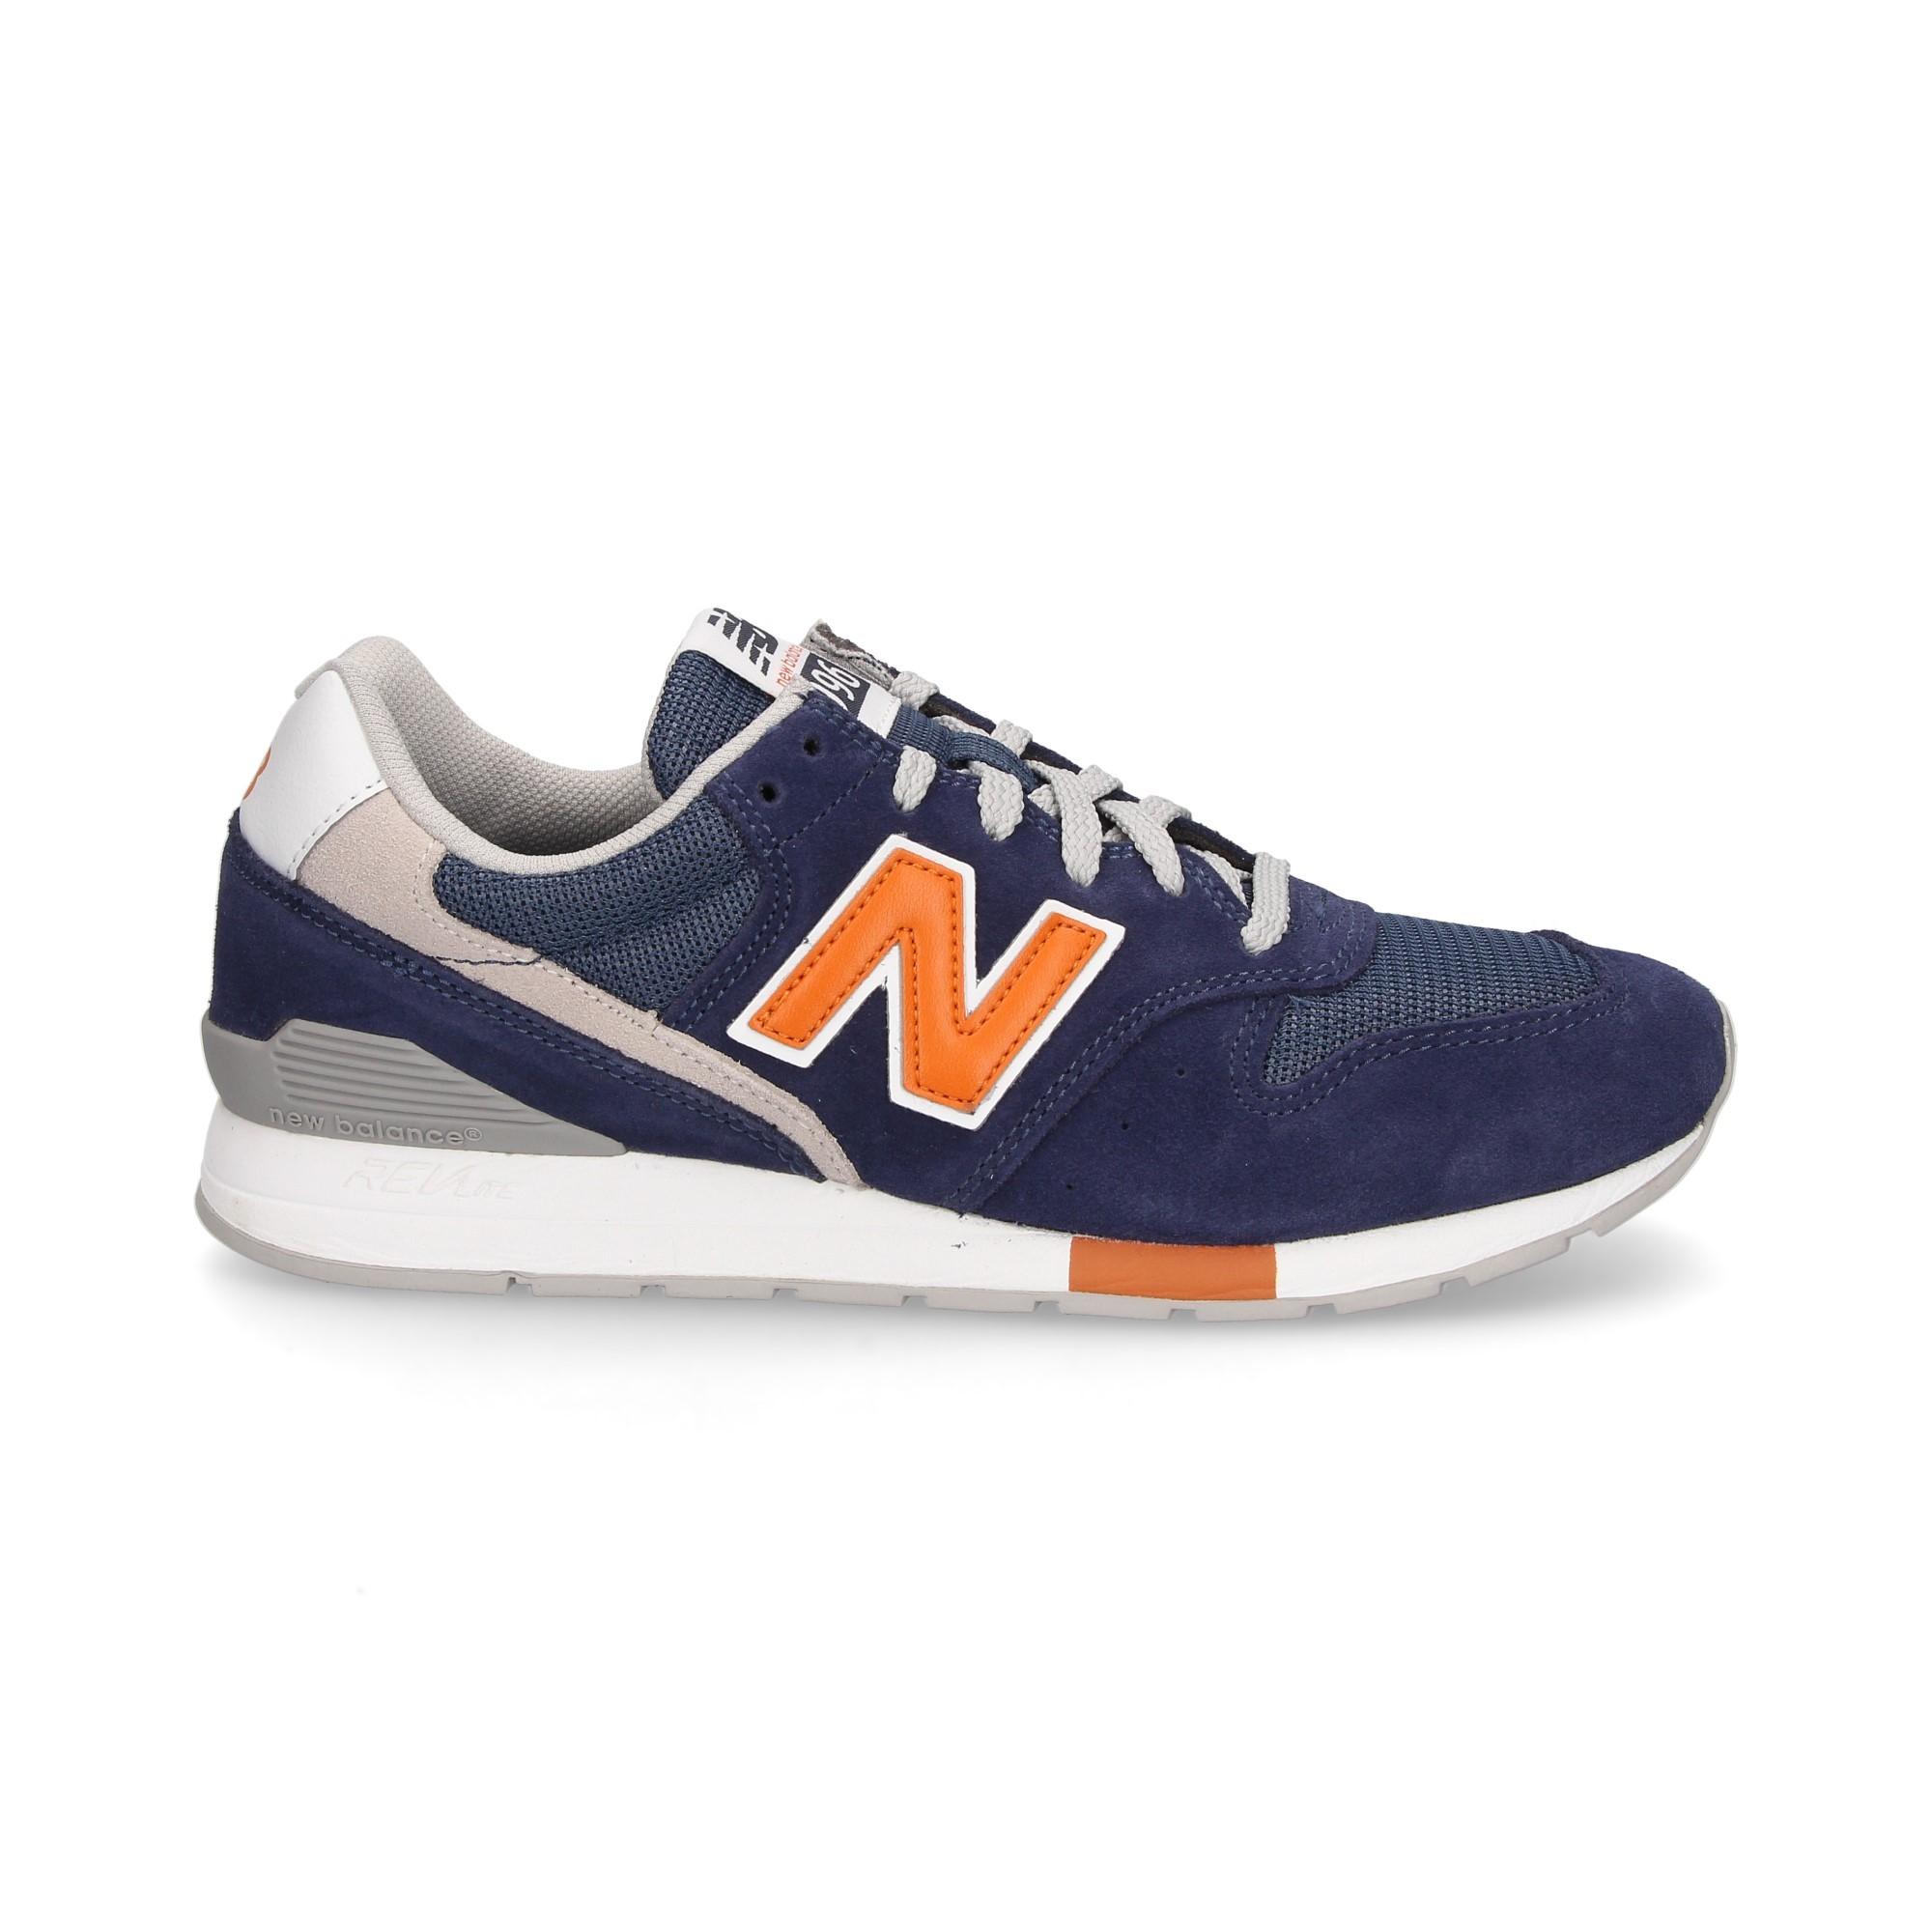 deportivo-malla-ante-azul-naranja